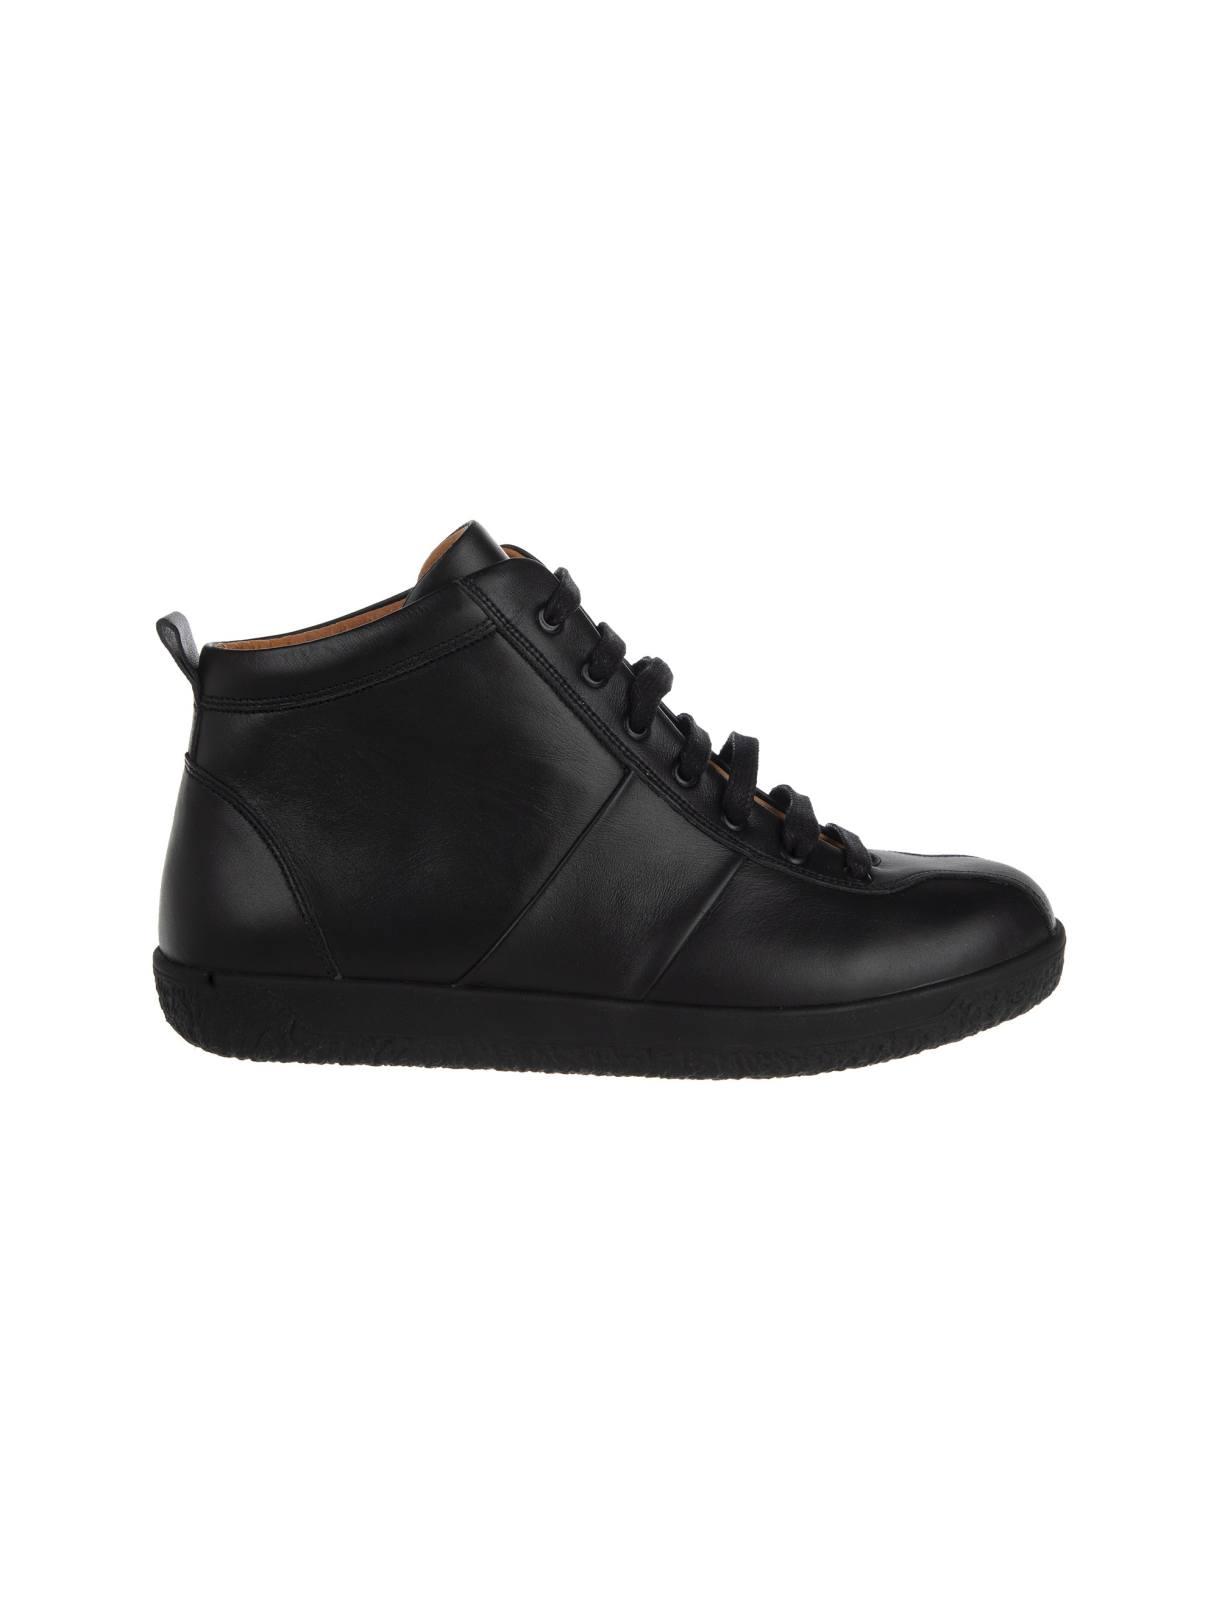 کتانی بندی چرم زنانه – برتونیکس  Women Leather Lace-up Sneakers – Berttonix